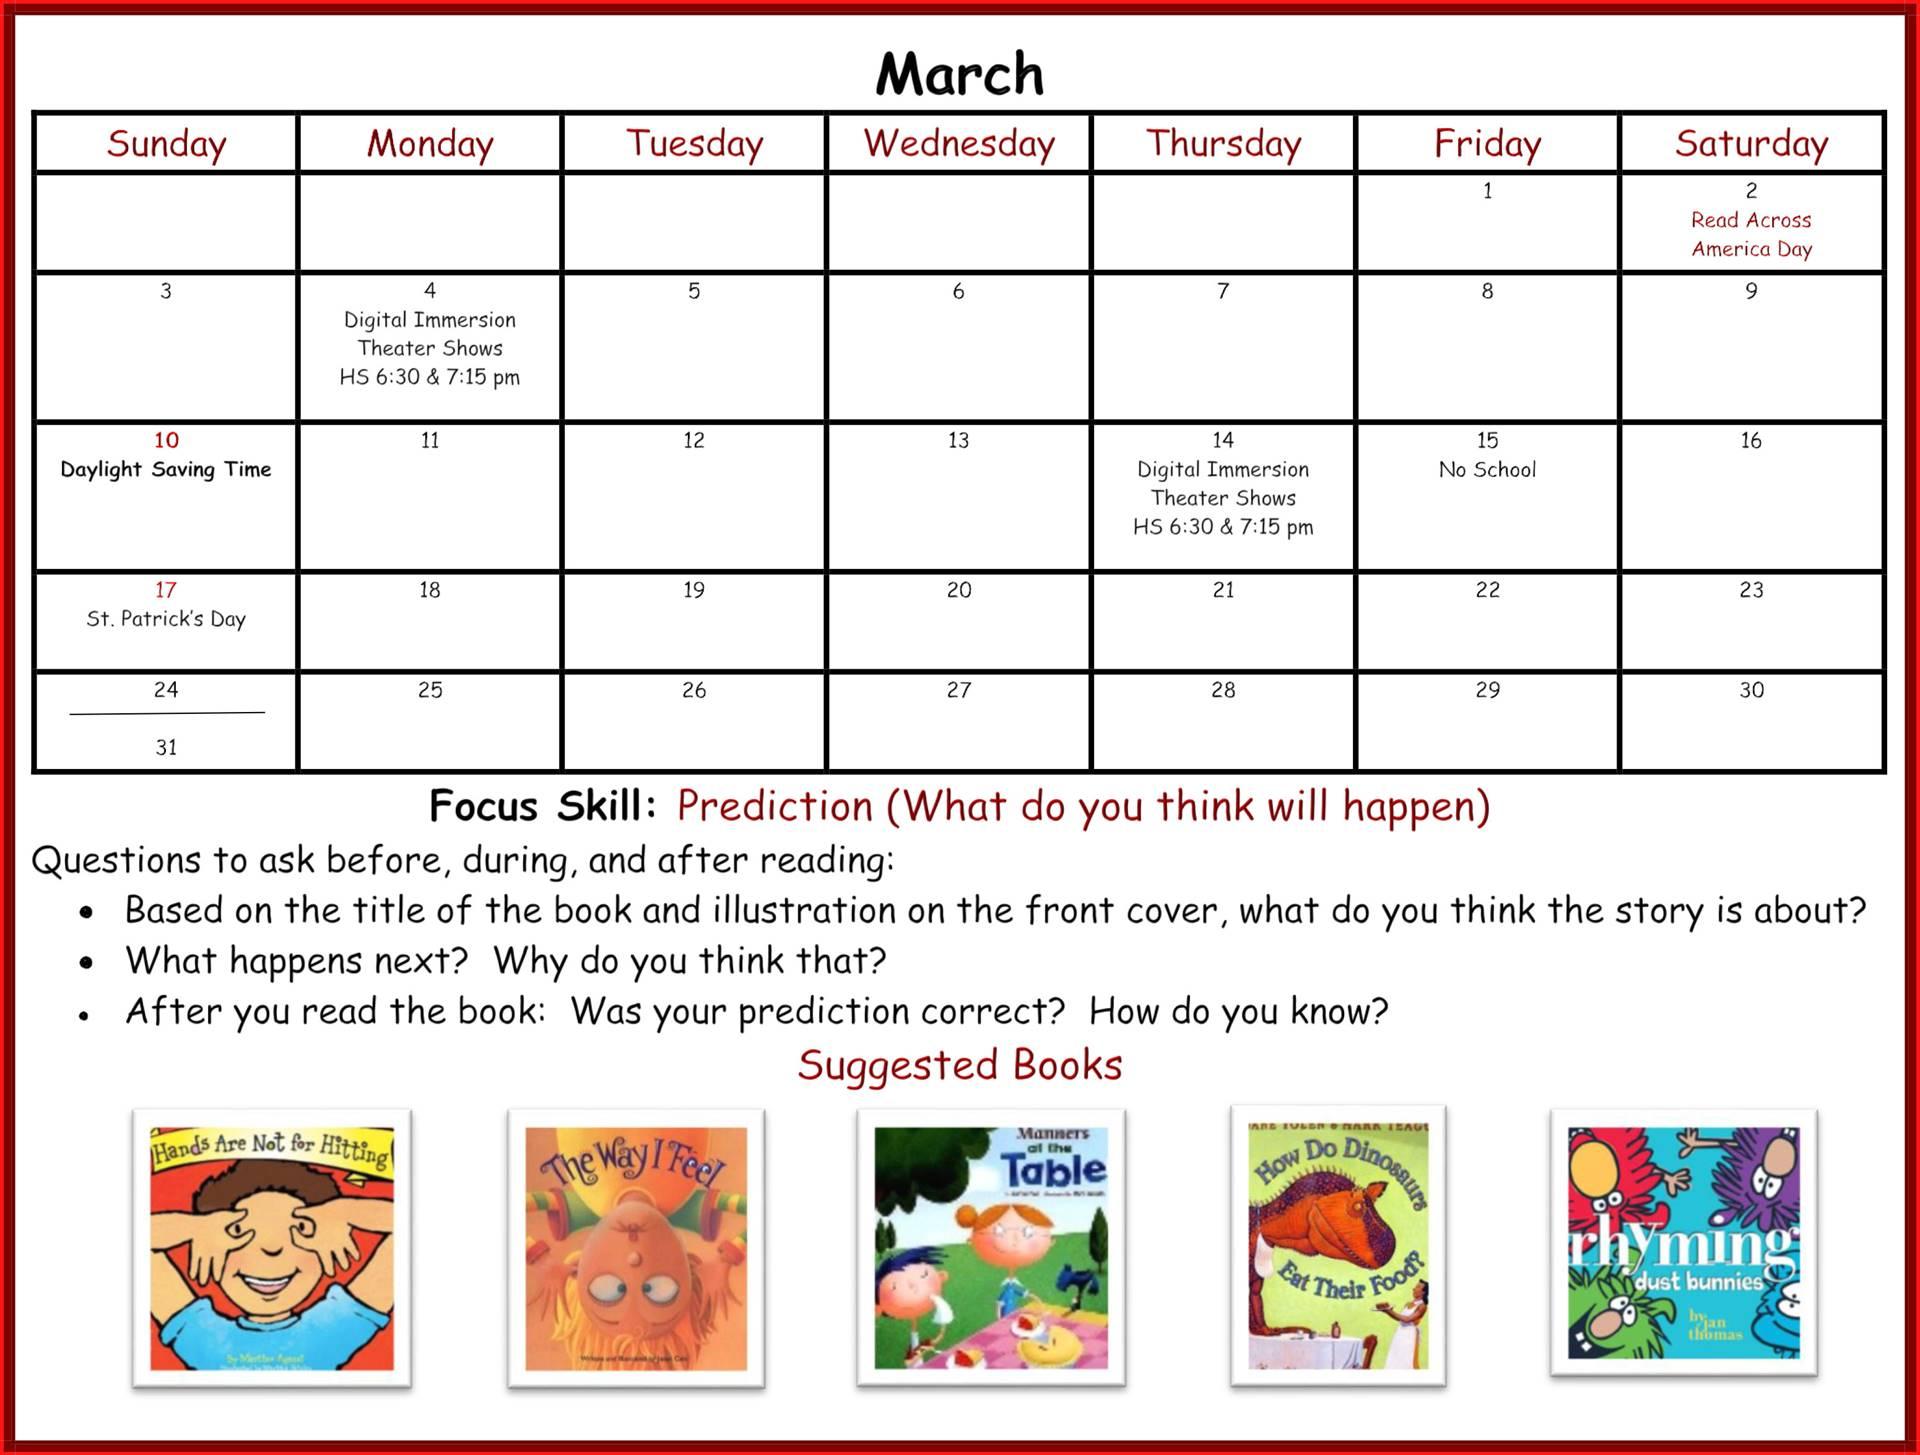 Kindergarten Readiness Calendar - March page 1